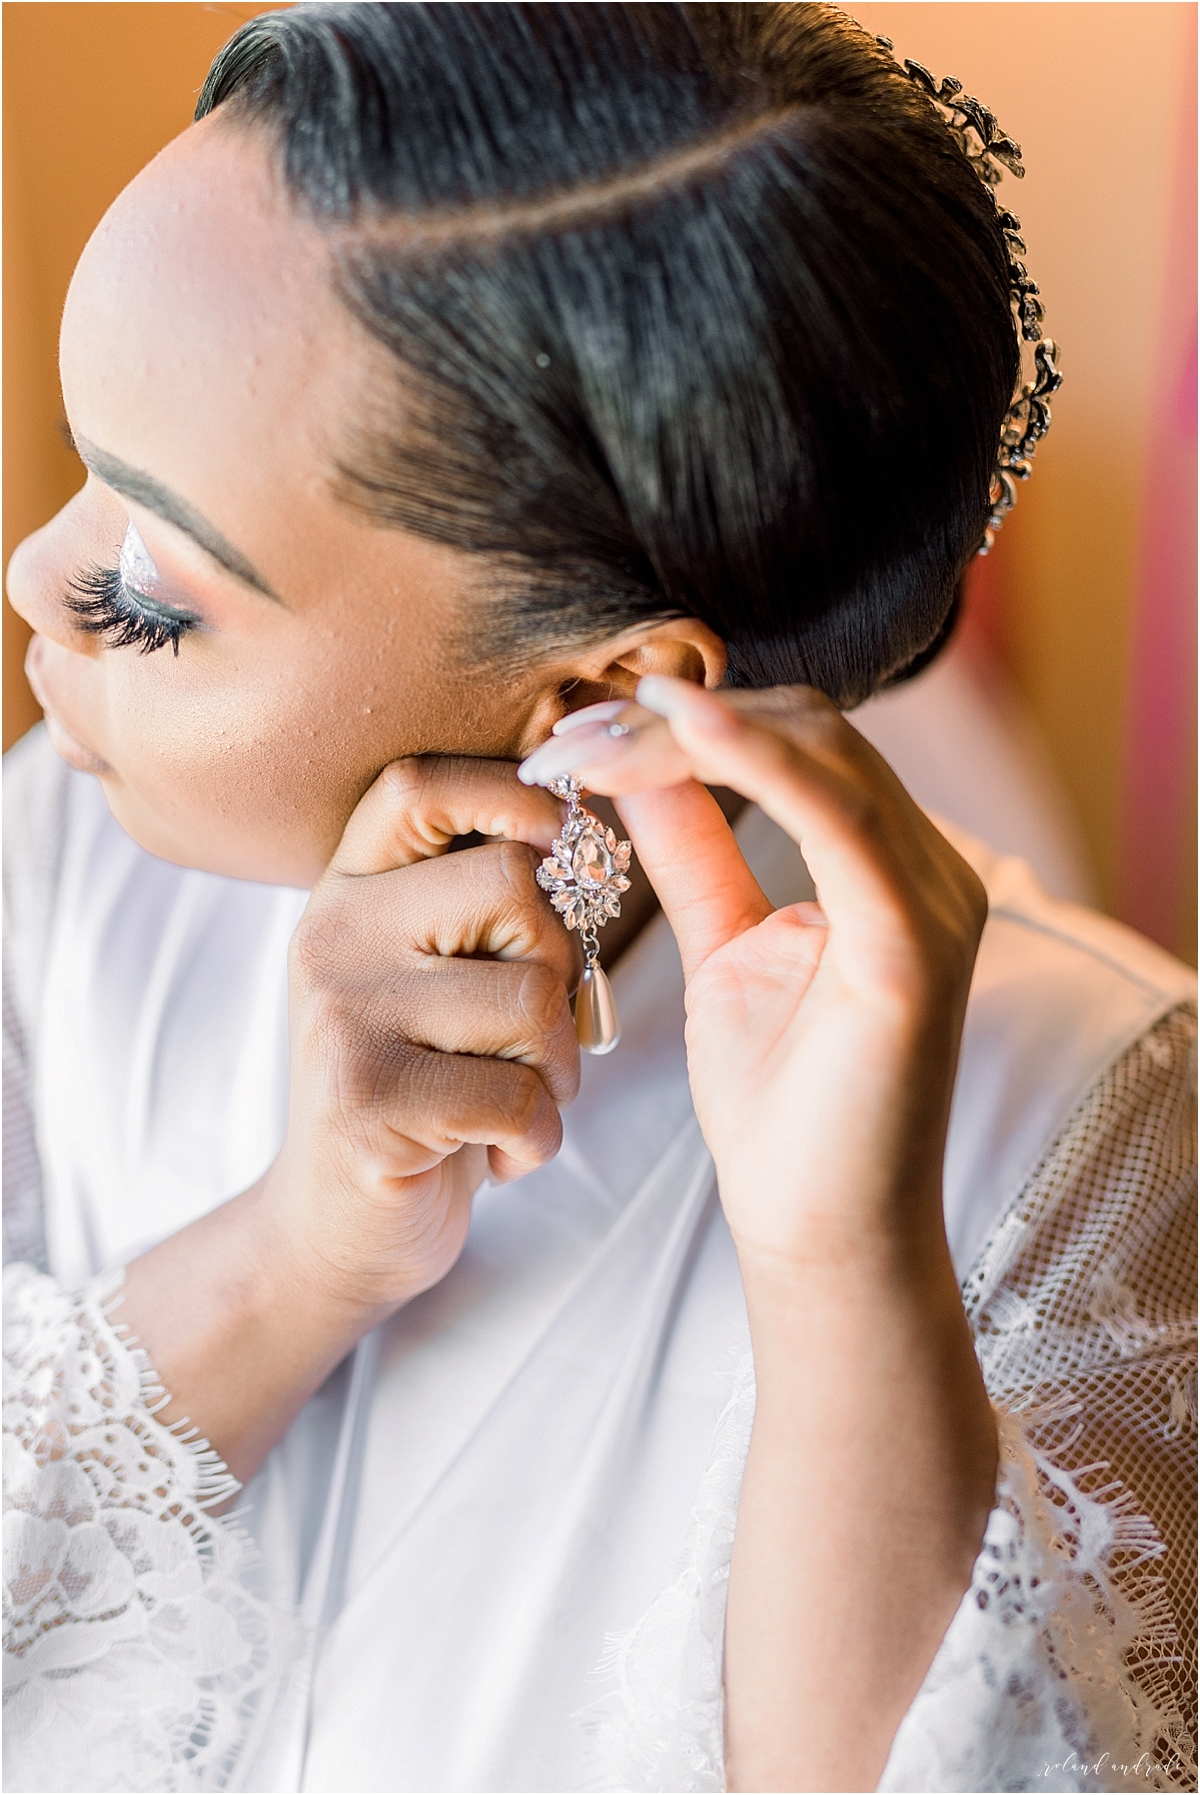 The Odyssey Wedding, Tinley Park Wedding, Chicago Wedding Photographer, Best Photographer In Tineley Park, Best Photographer In Chicago, Light And Airy Photographer_0028.jpg